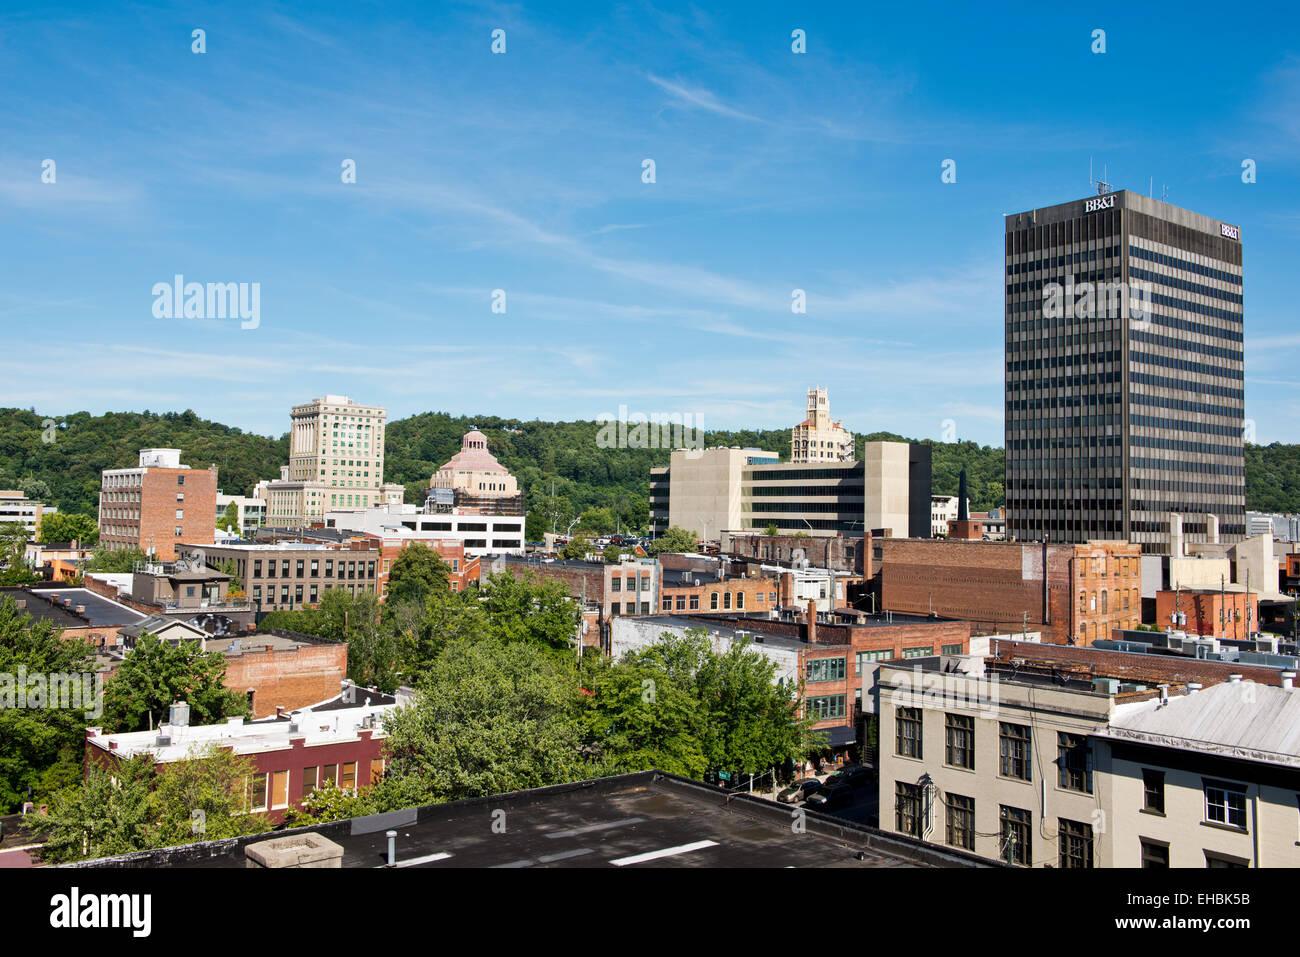 Asheville North Carolina city skyline - Stock Image